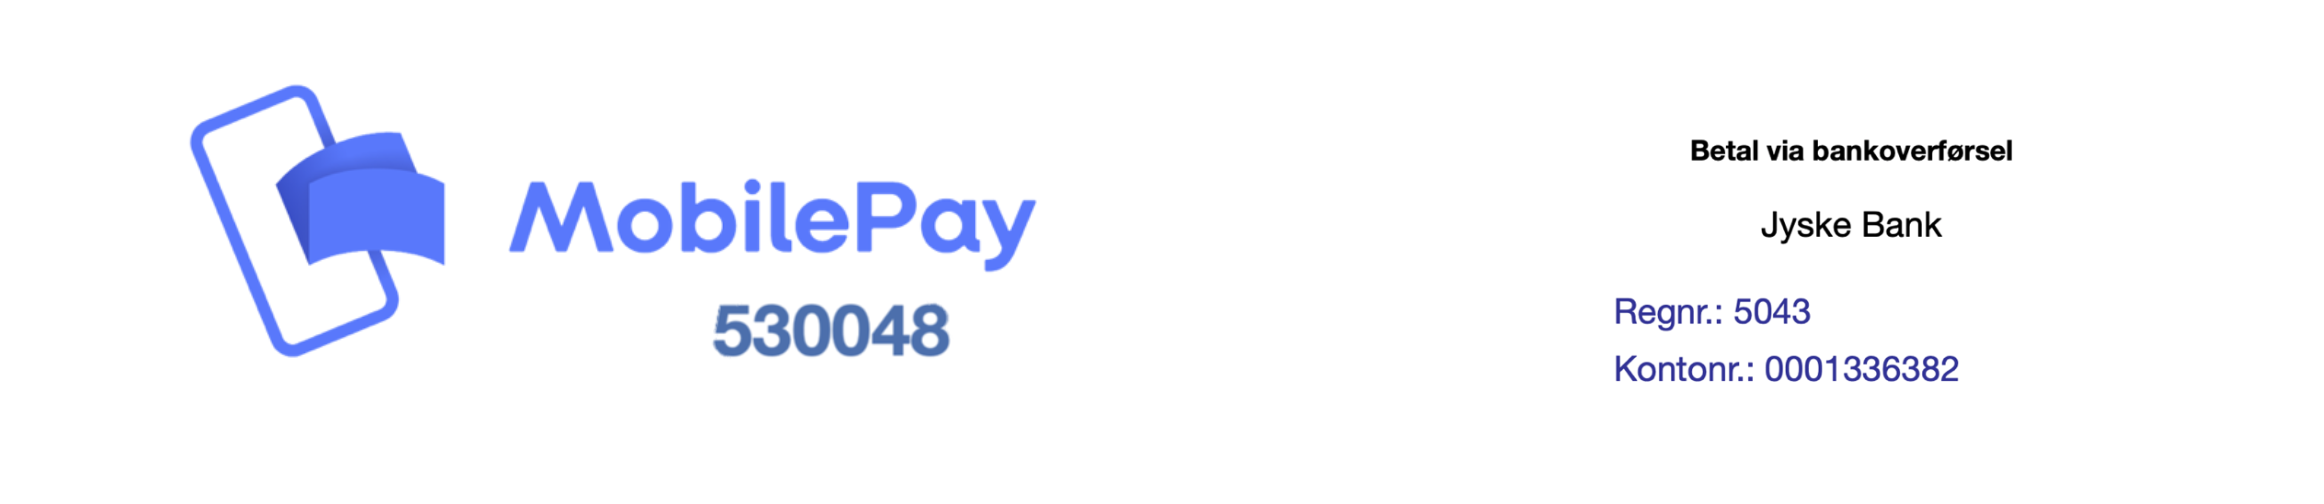 betaling.mobilepay.